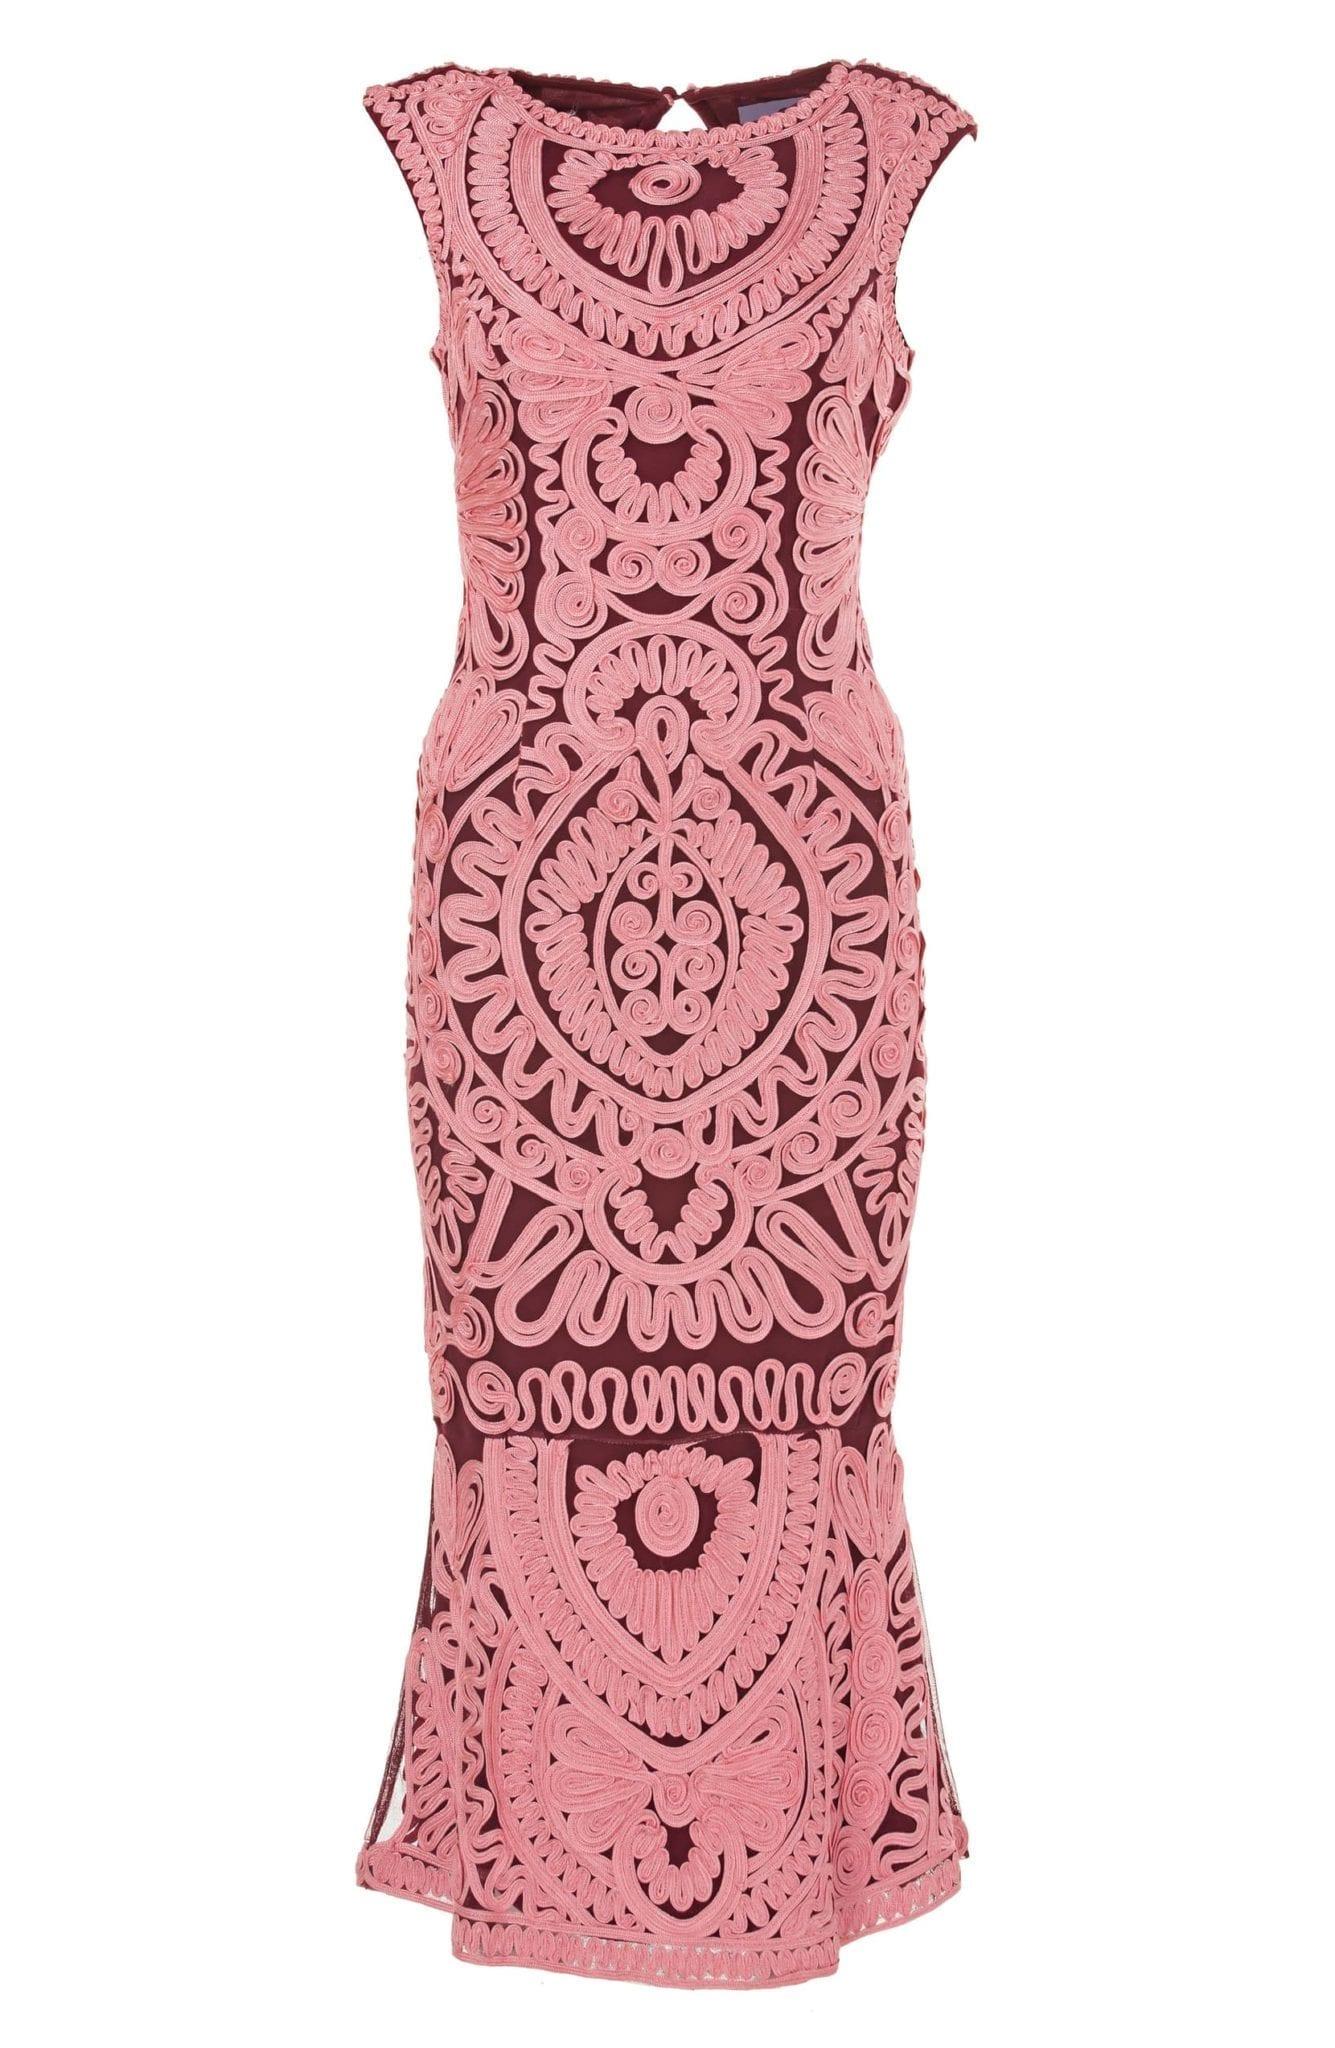 Js Collections Soutache Mesh Pink Dress We Select Dresses